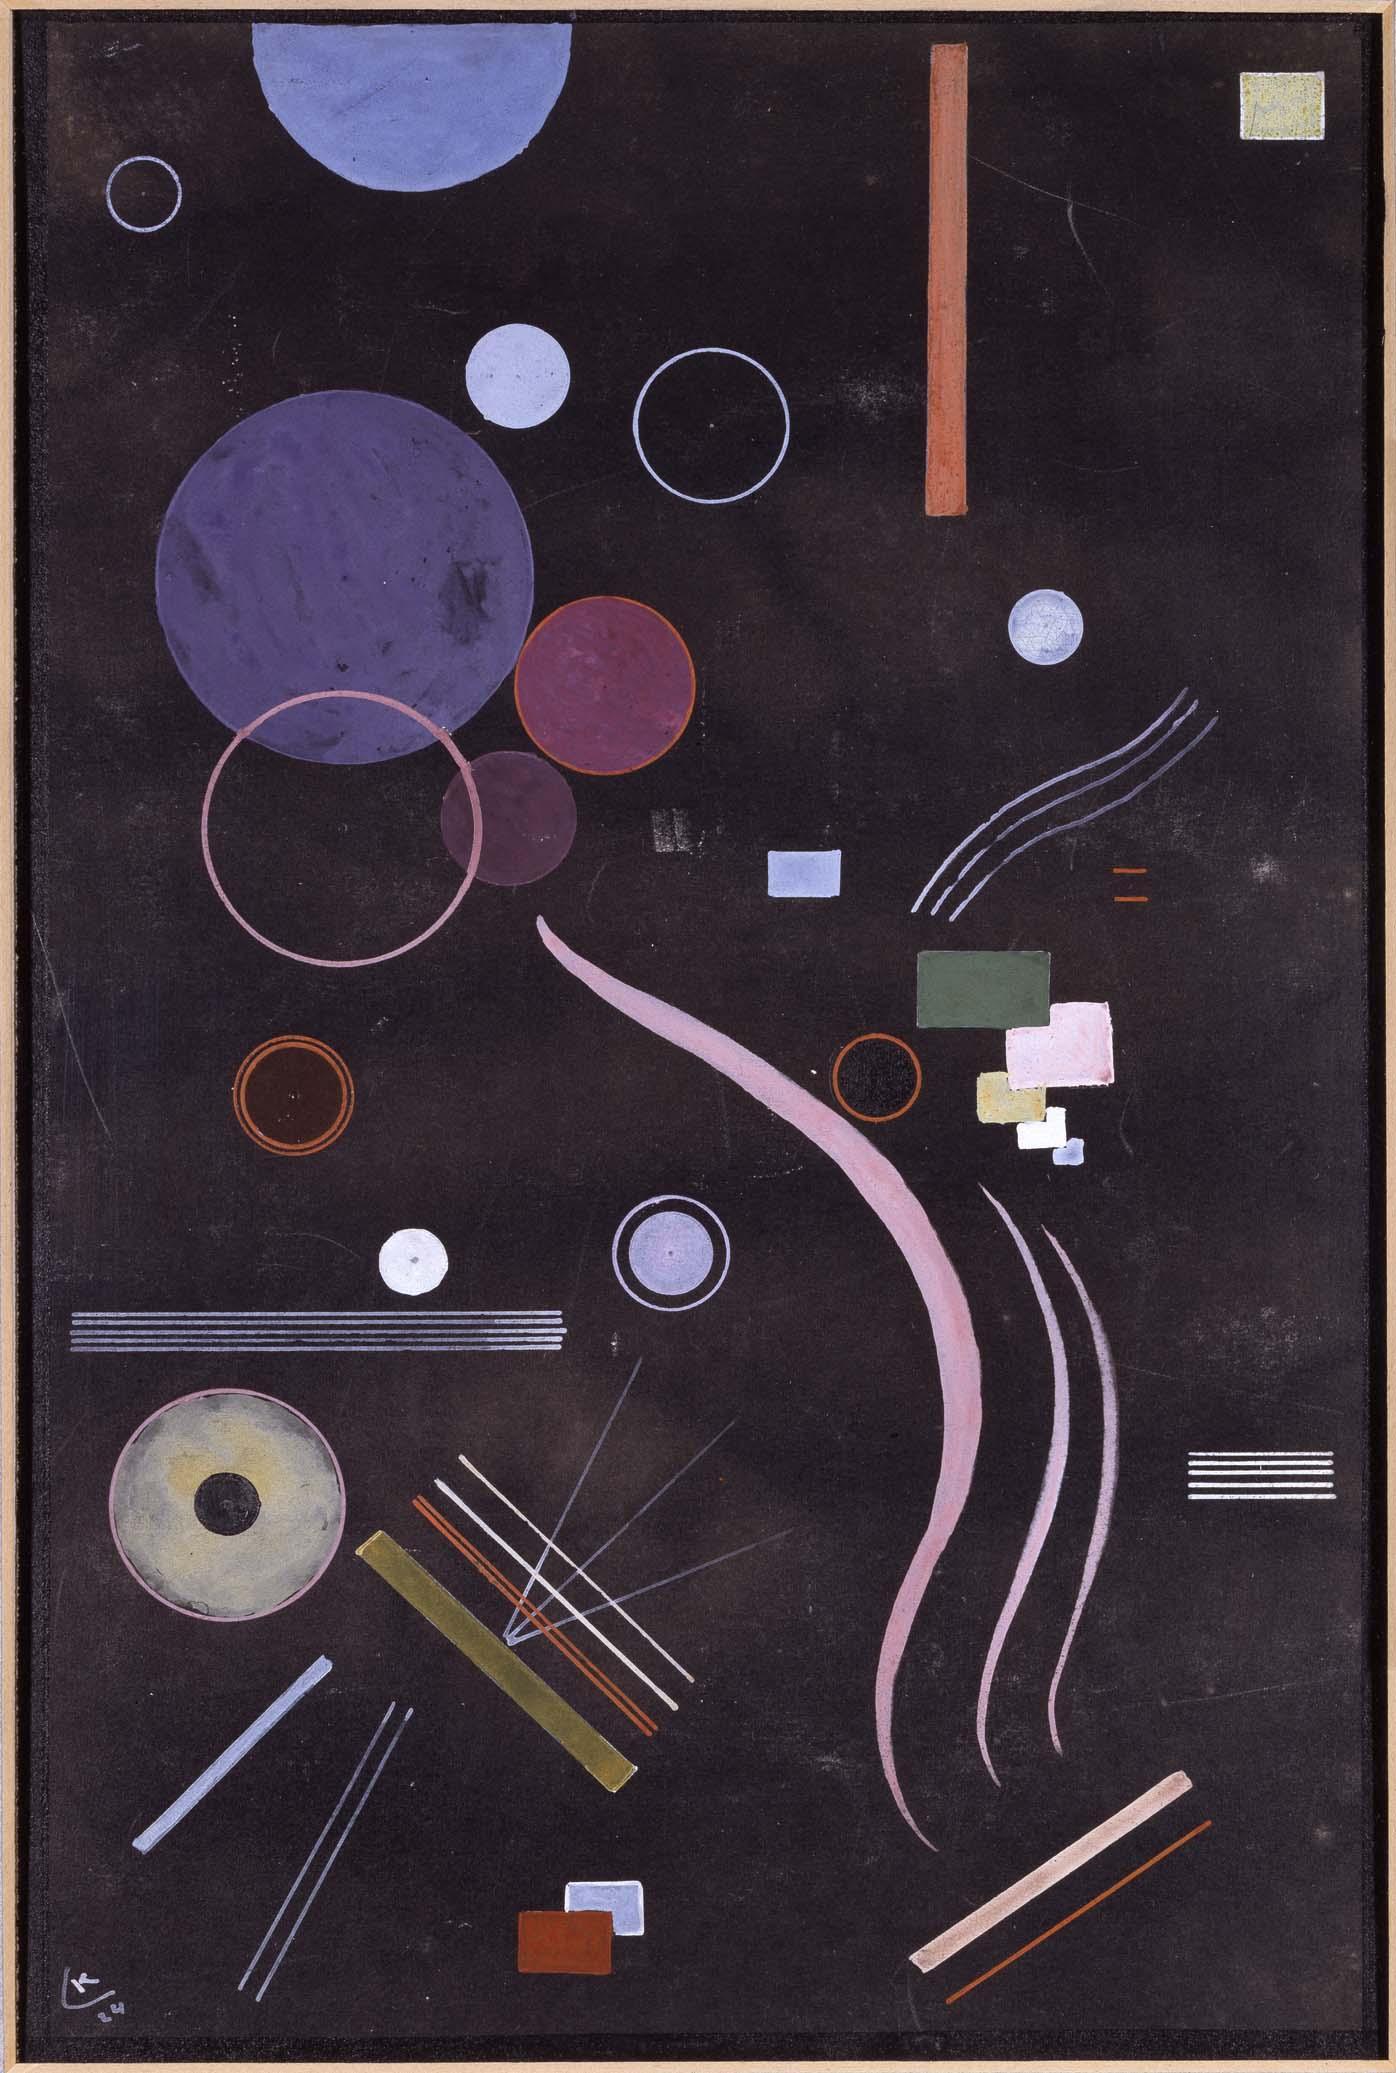 Wasilij Kandinskij, acentrico